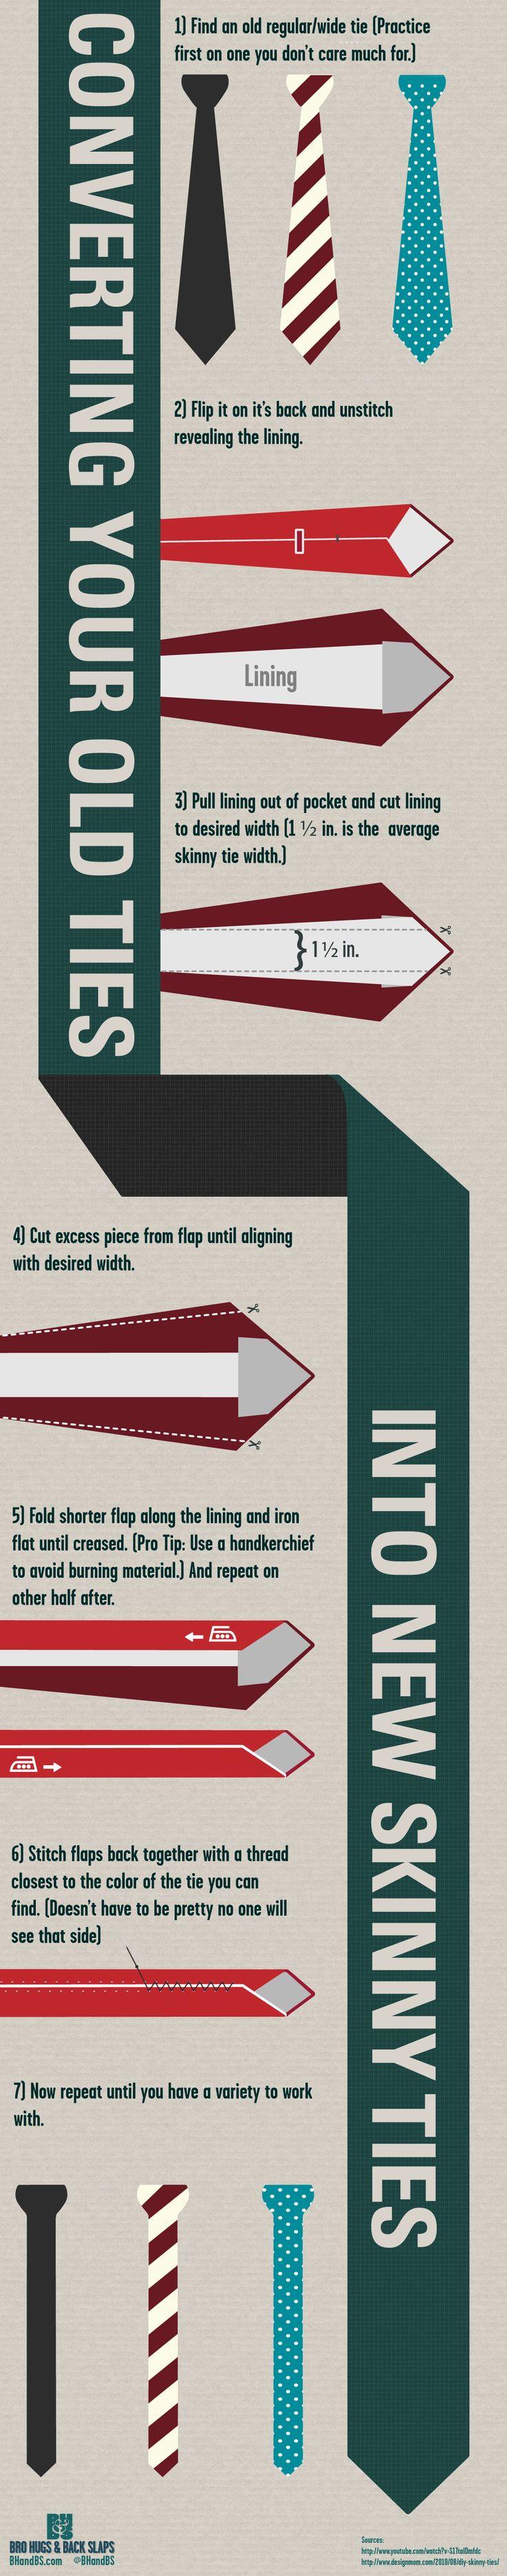 25+ unique Old ties ideas on Pinterest | DIY upcycled ties, Tie ...